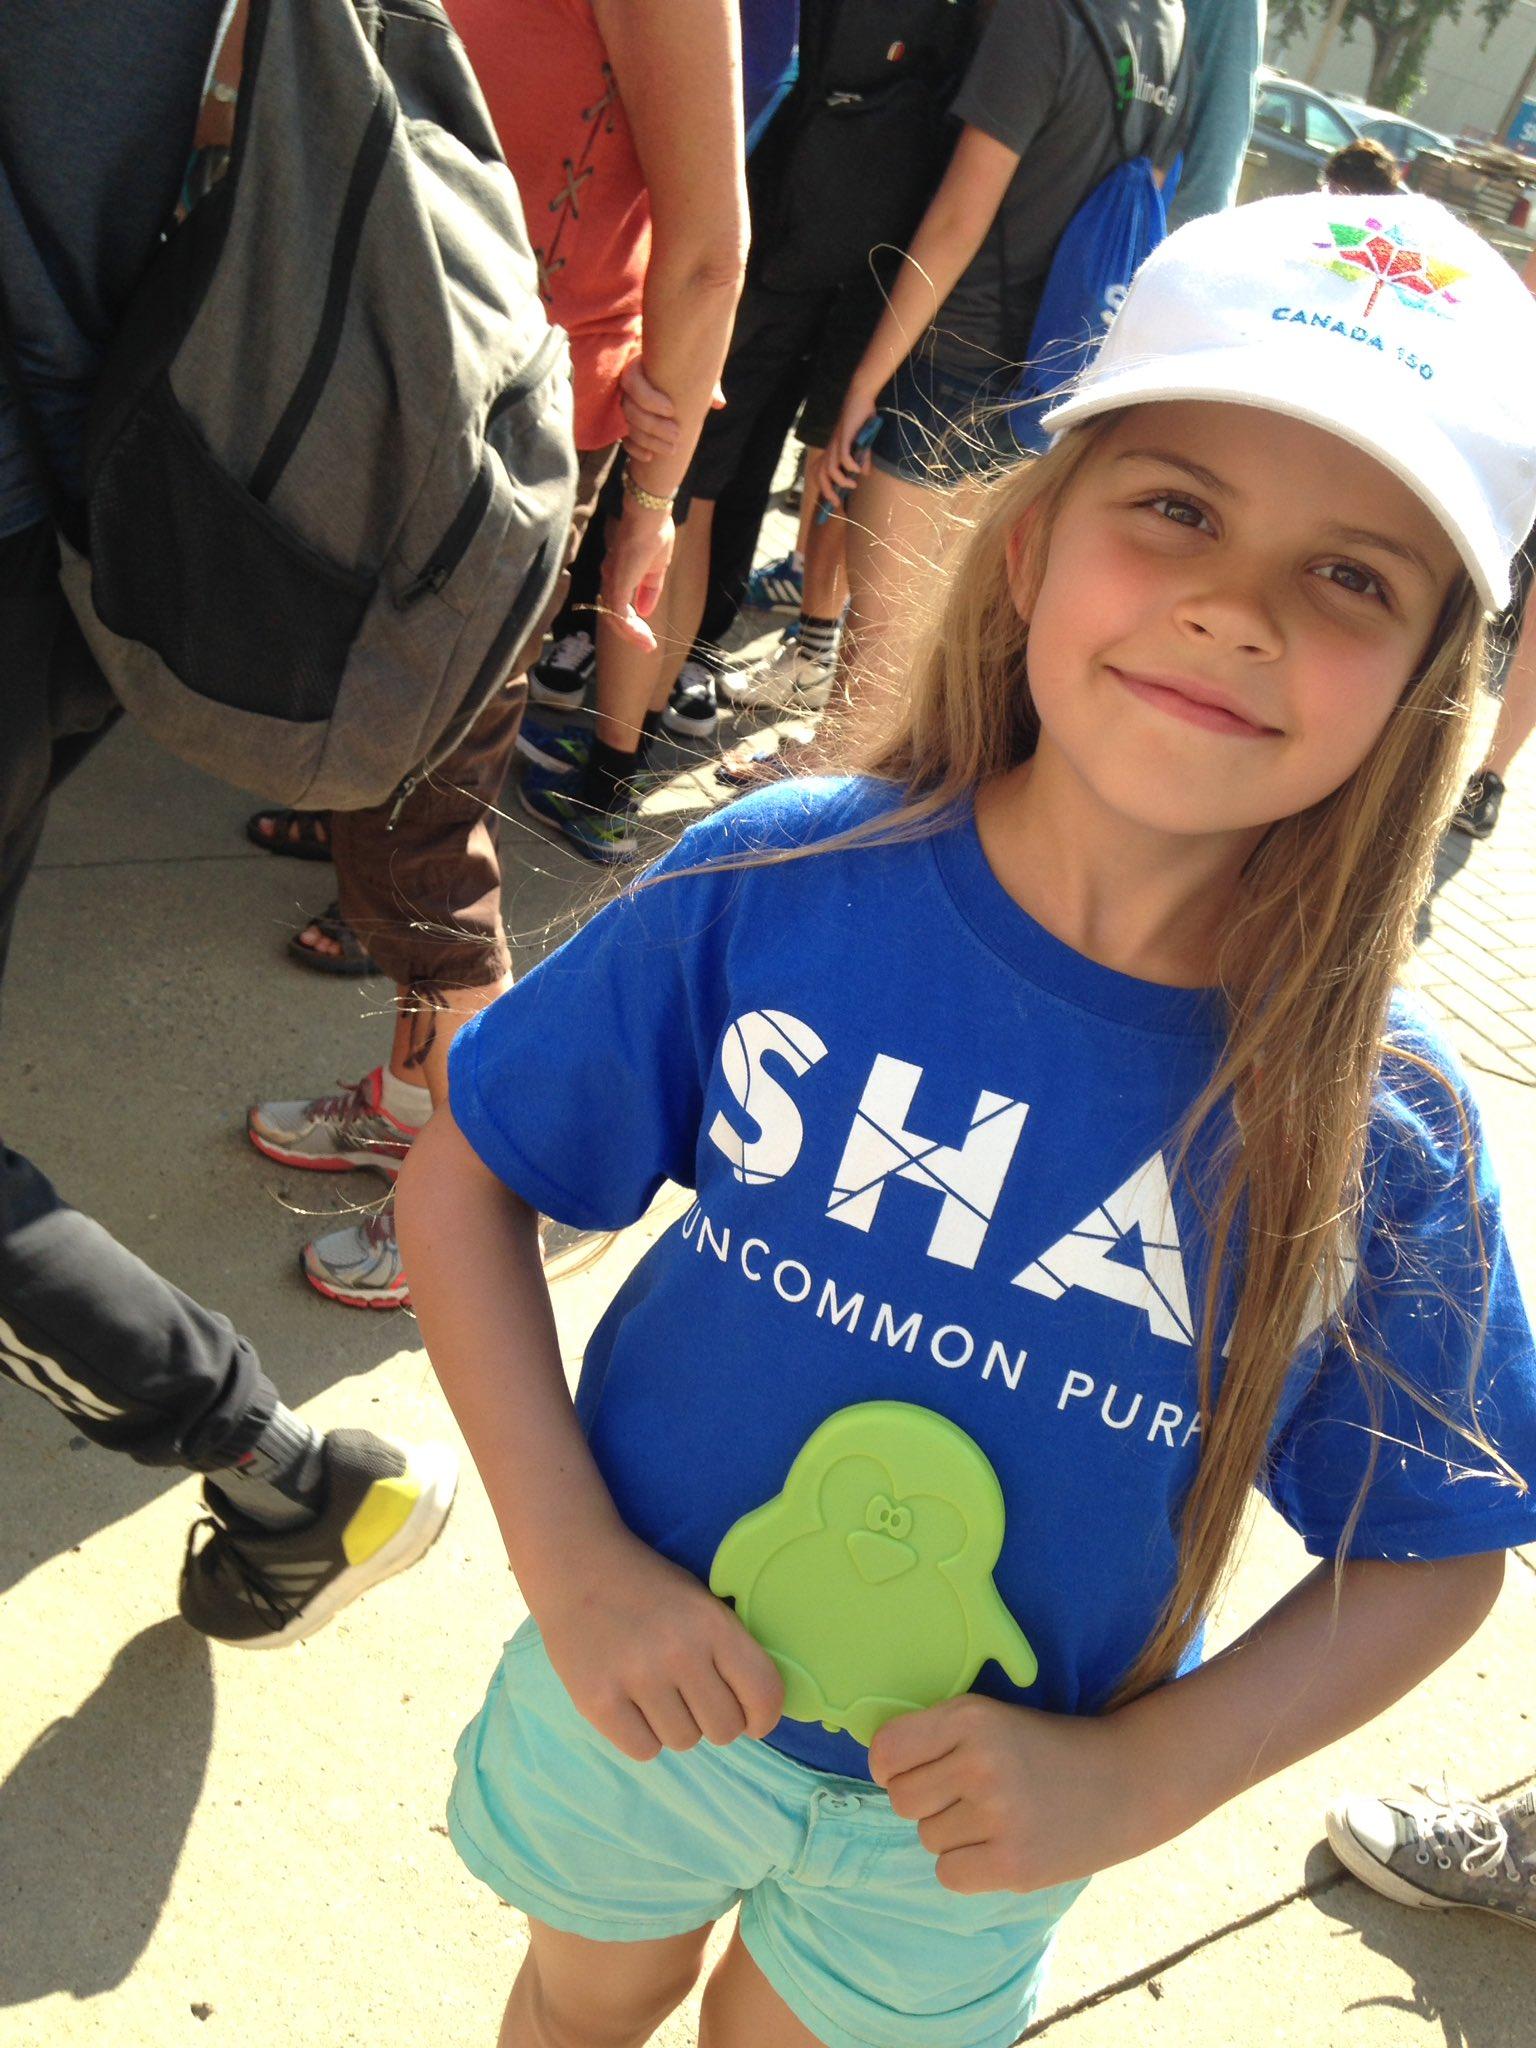 Future Shad Fellow: Year 2024. #SHAD2017 #SHADOpen #ShadSask https://t.co/BsJkdci8uD